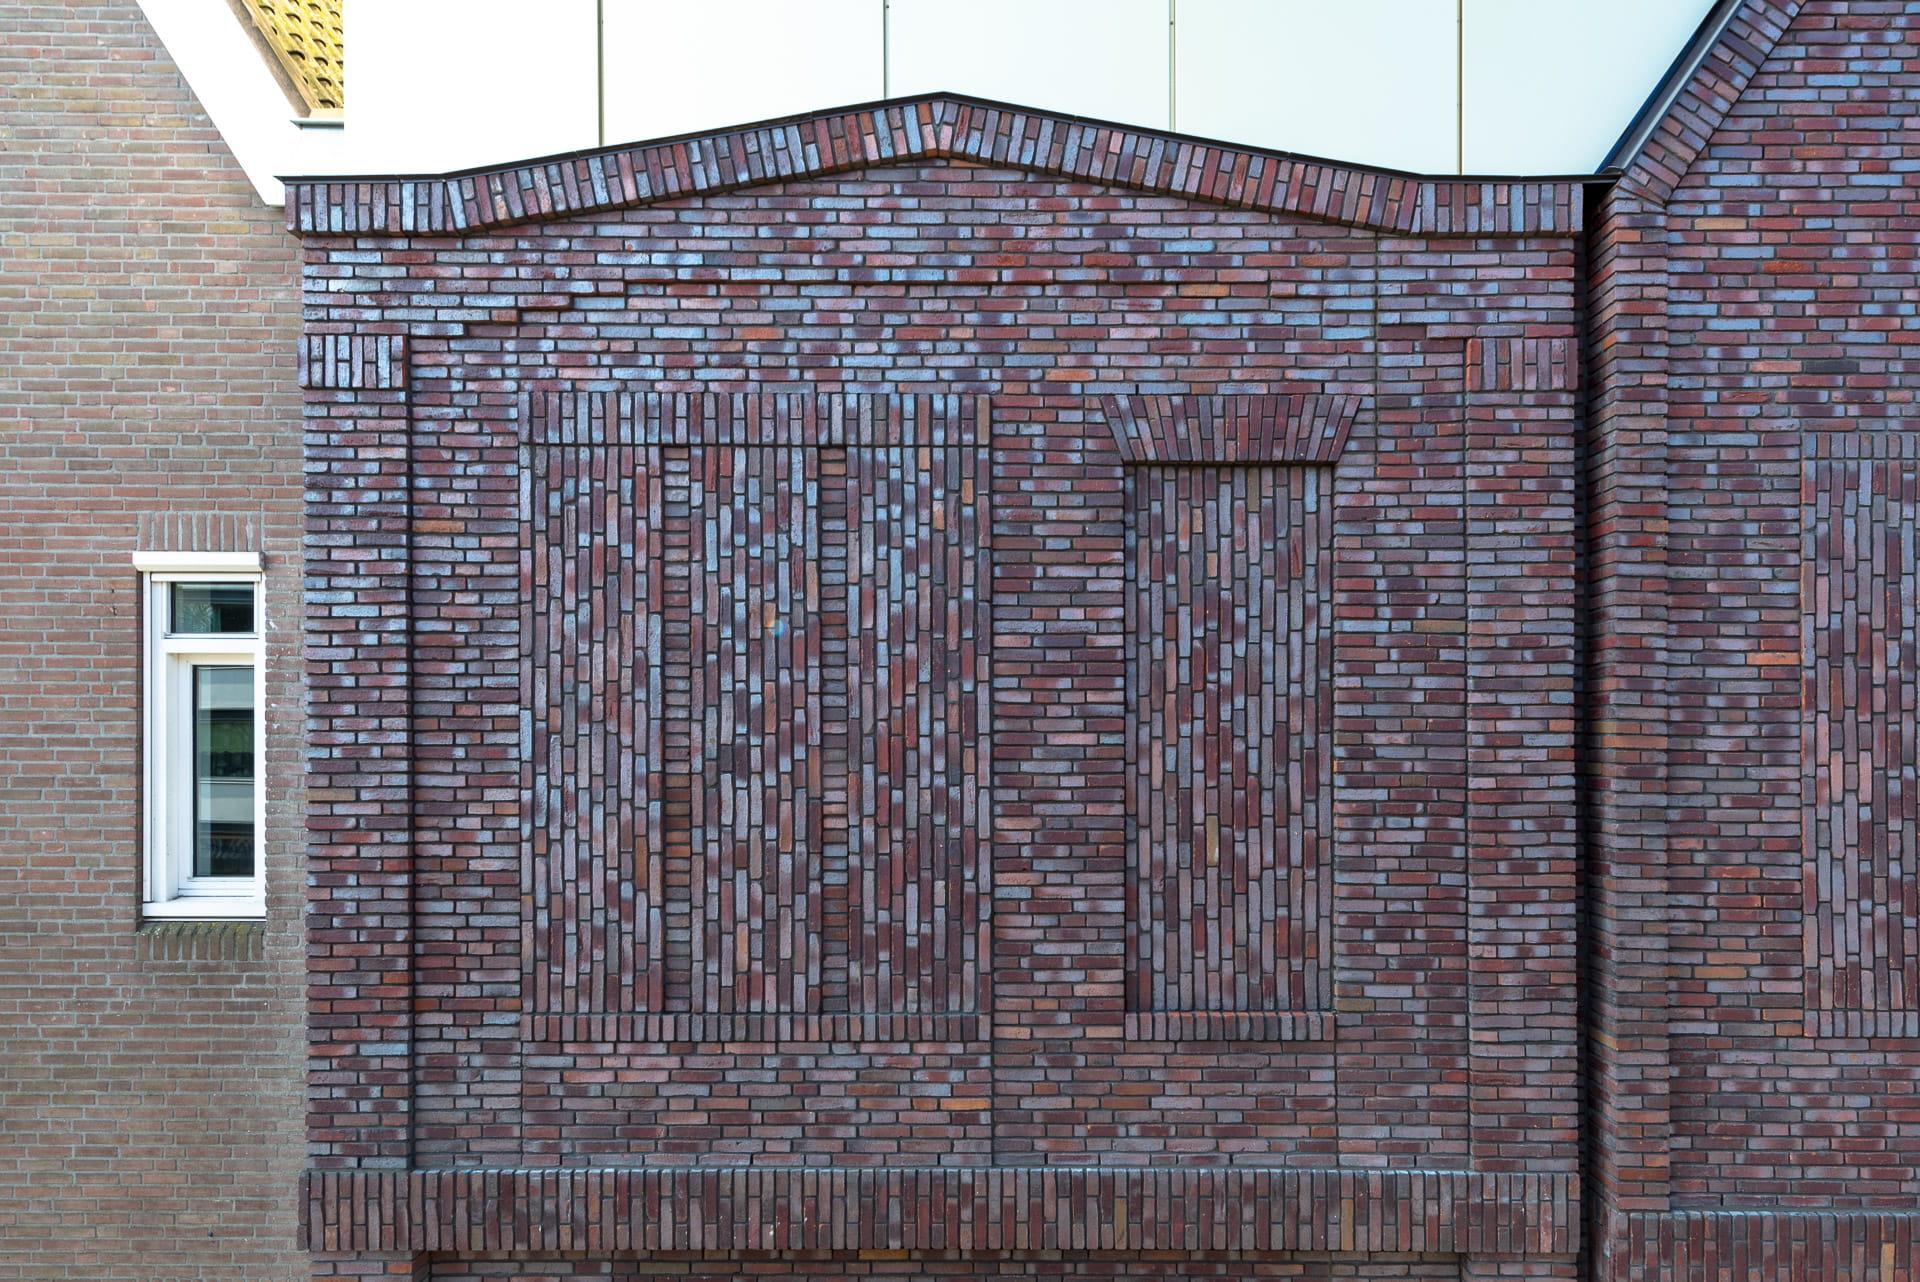 Detail van een muur met diepte in het metselwerk